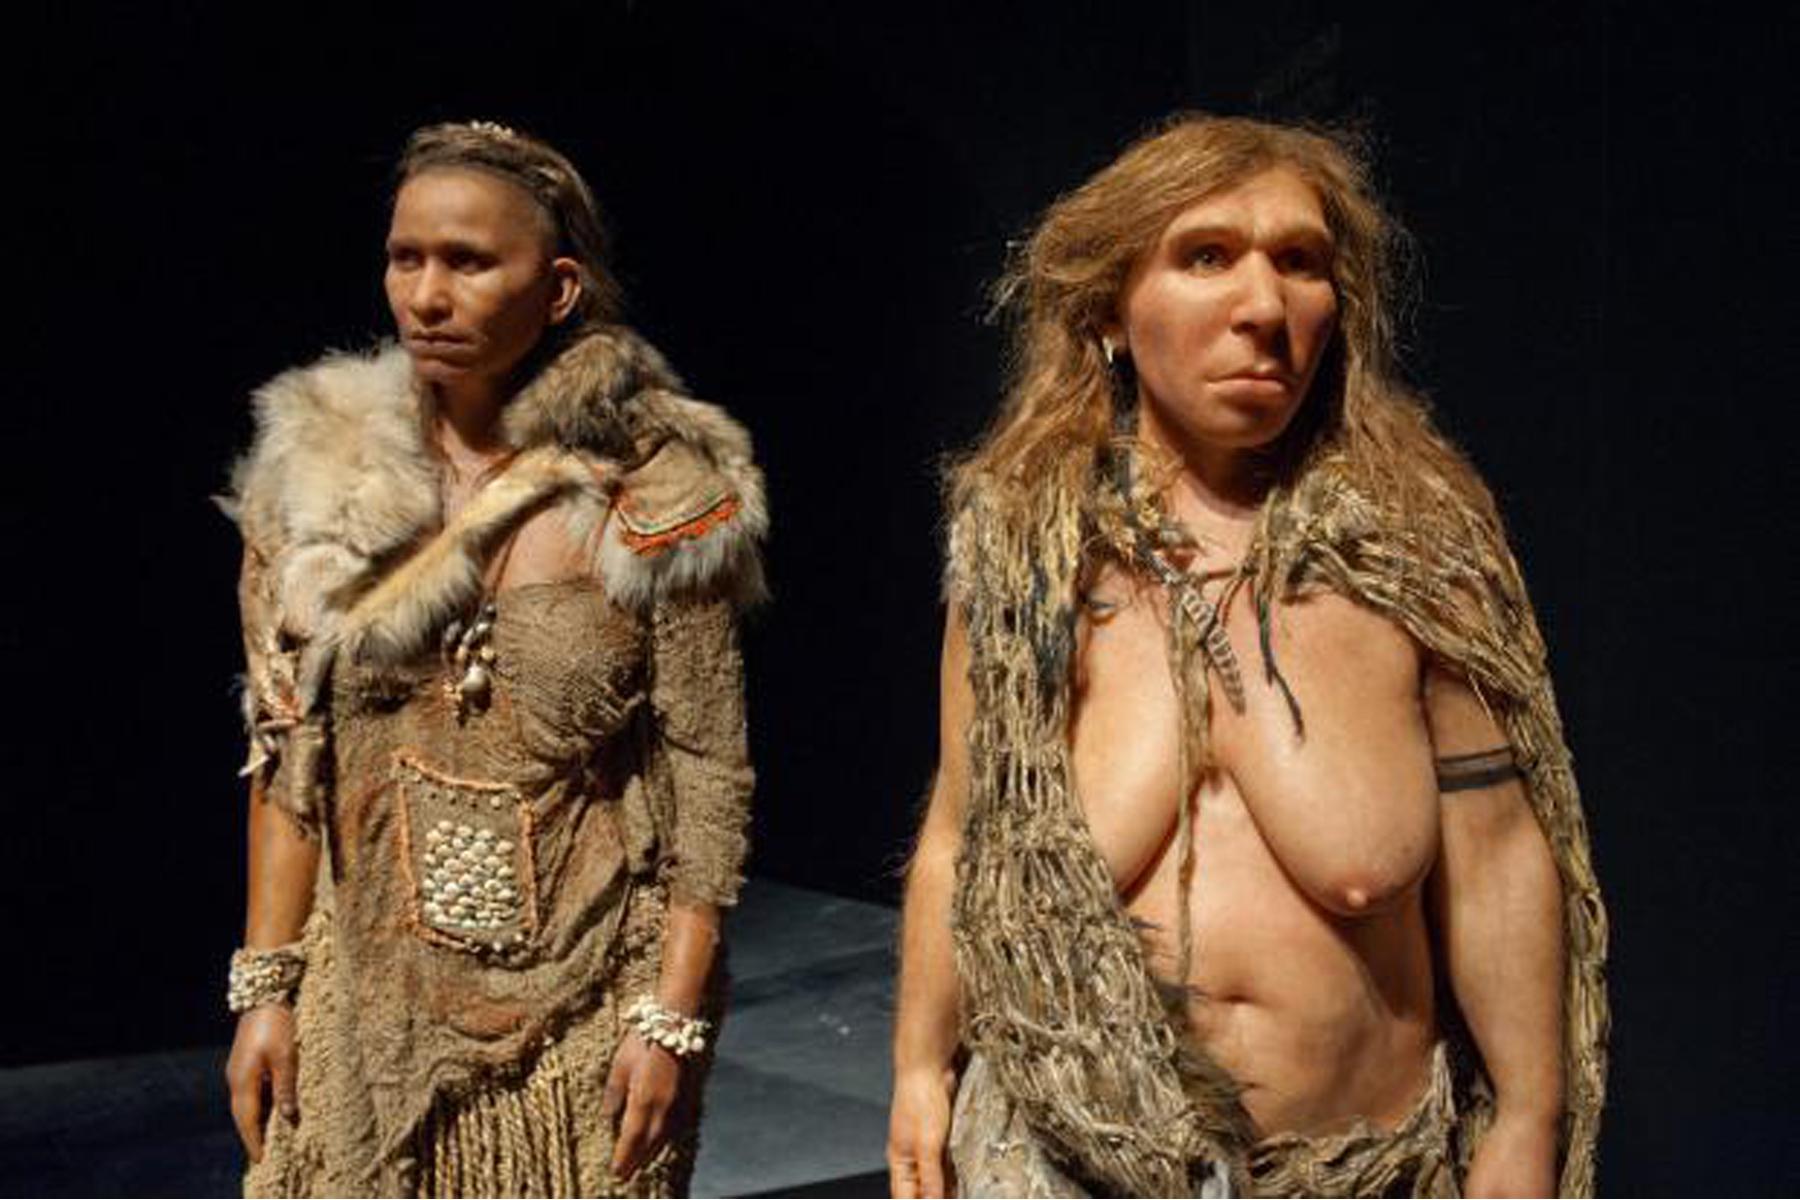 neandertalieni